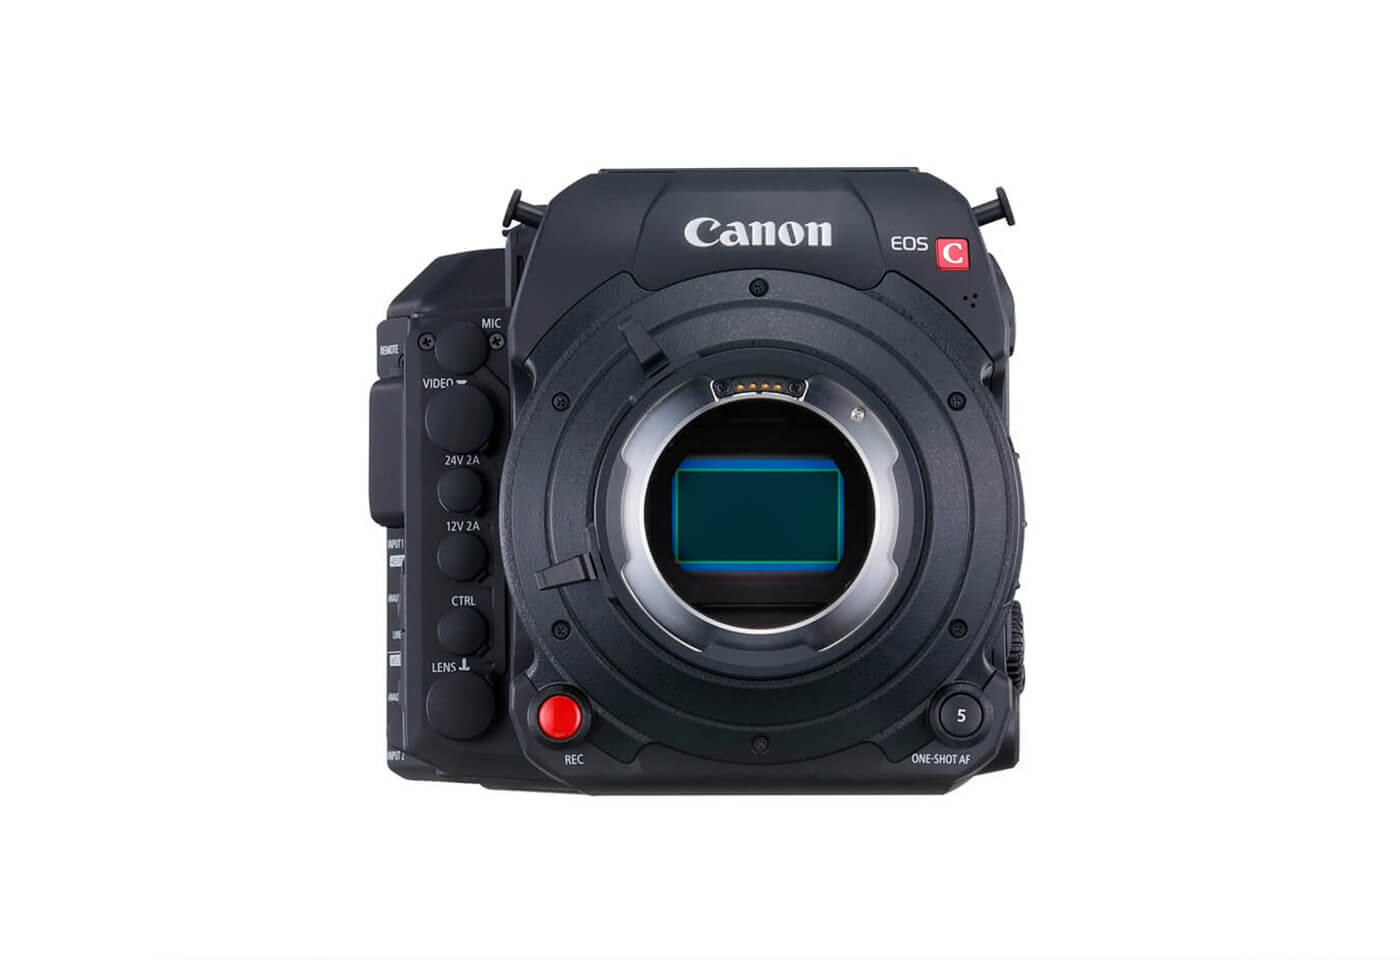 C700 FF front image